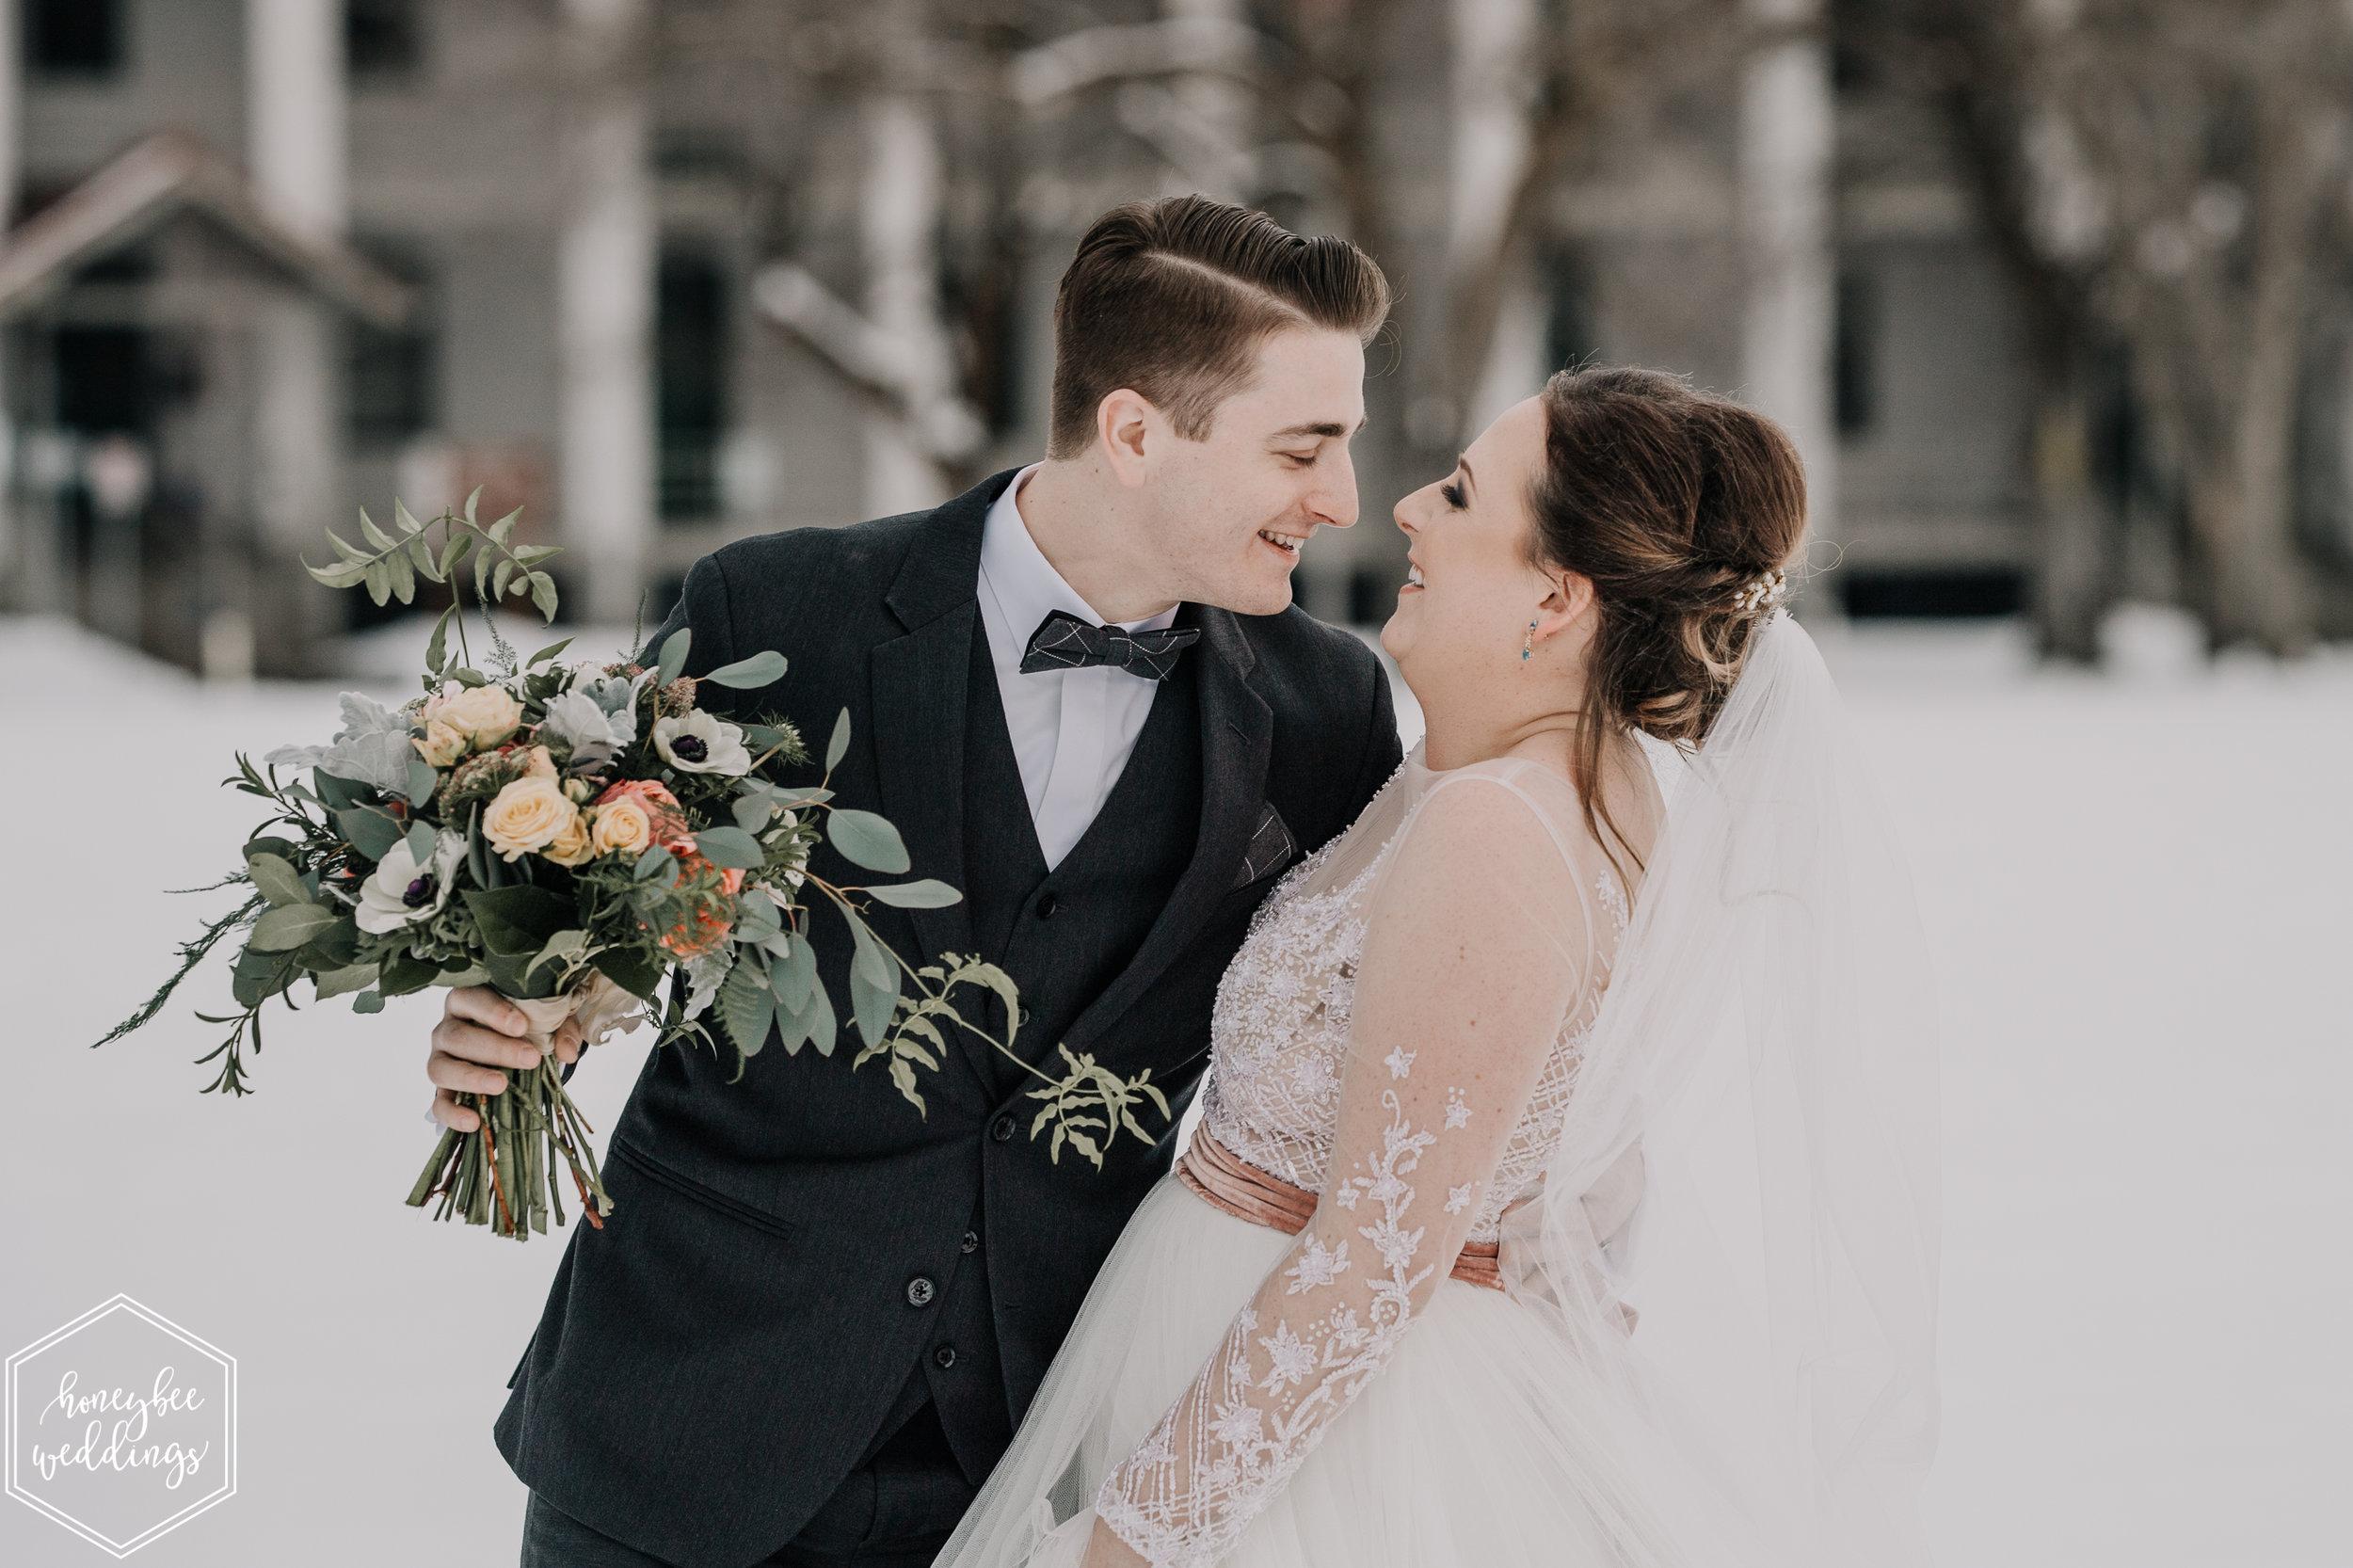 0102Montana Wedding Photographer_Montana winter wedding_Wedding at Fort Missoula_Meri & Carter_December 31, 2015-539.jpg